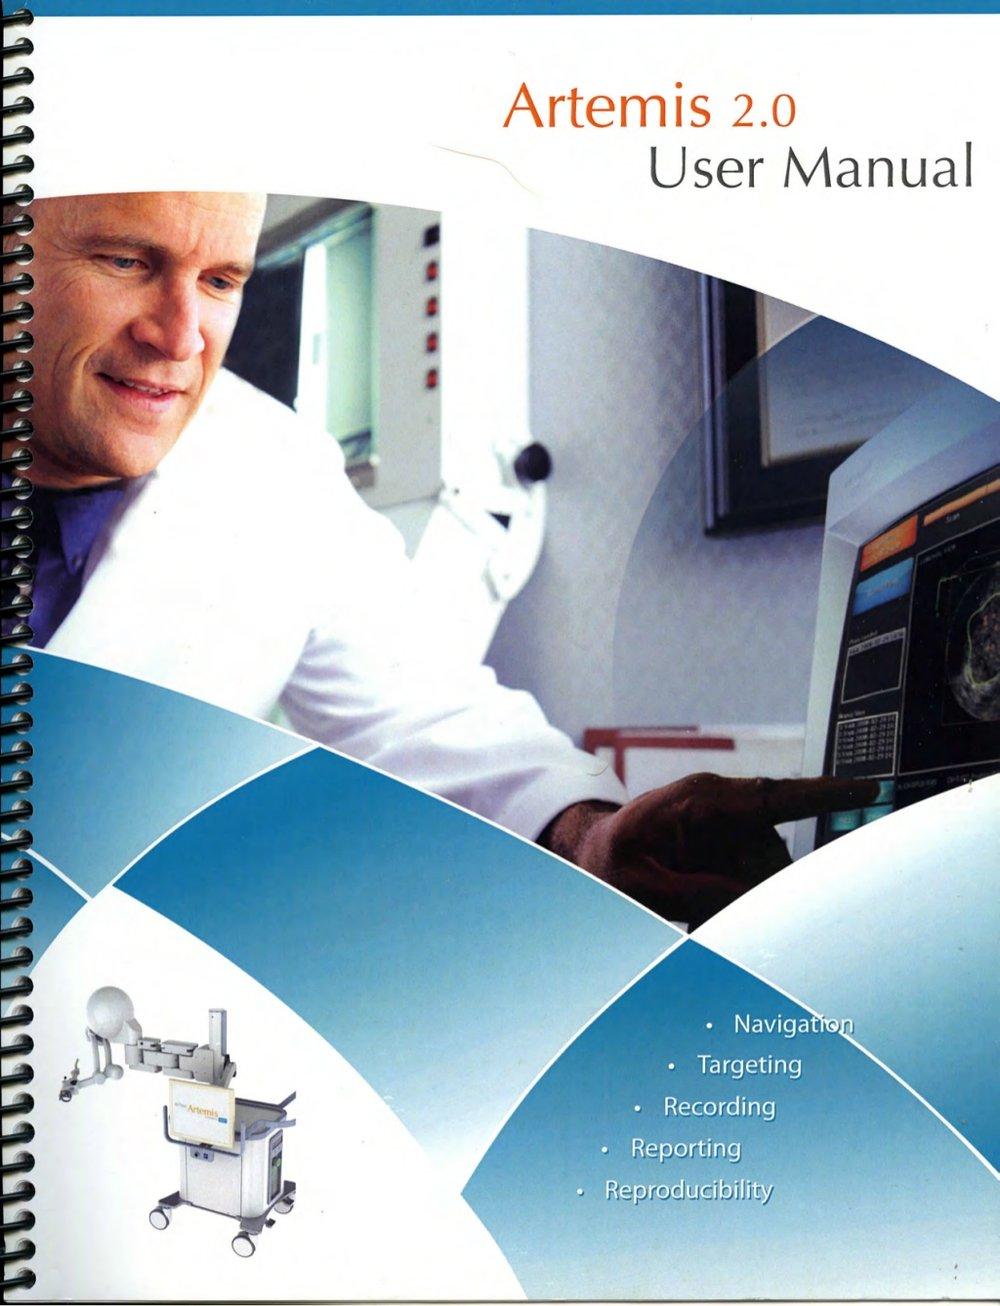 Medical Device IFU